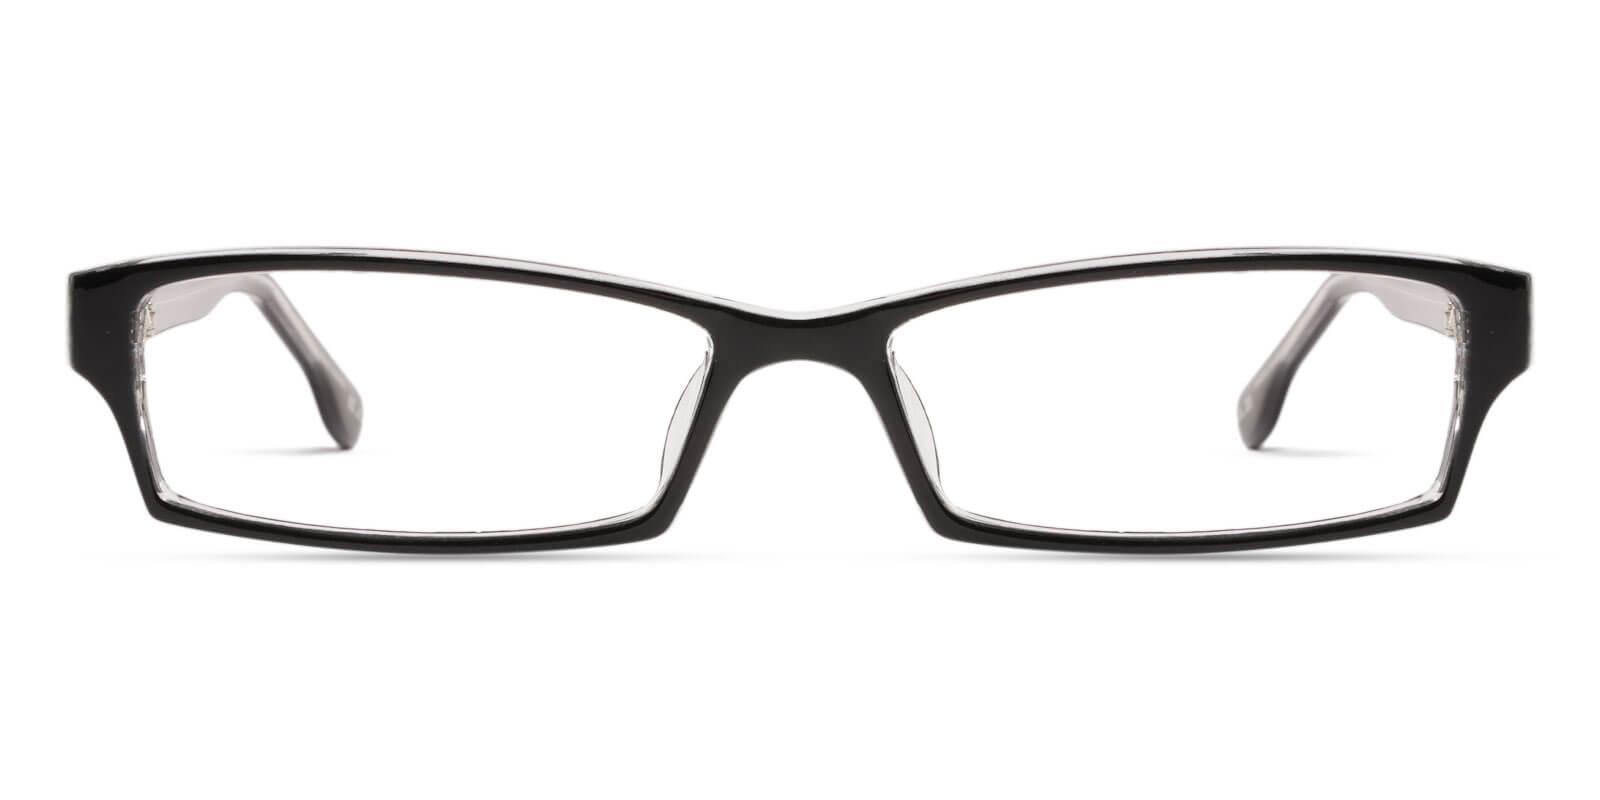 Ebony Black Plastic Eyeglasses , UniversalBridgeFit Frames from ABBE Glasses